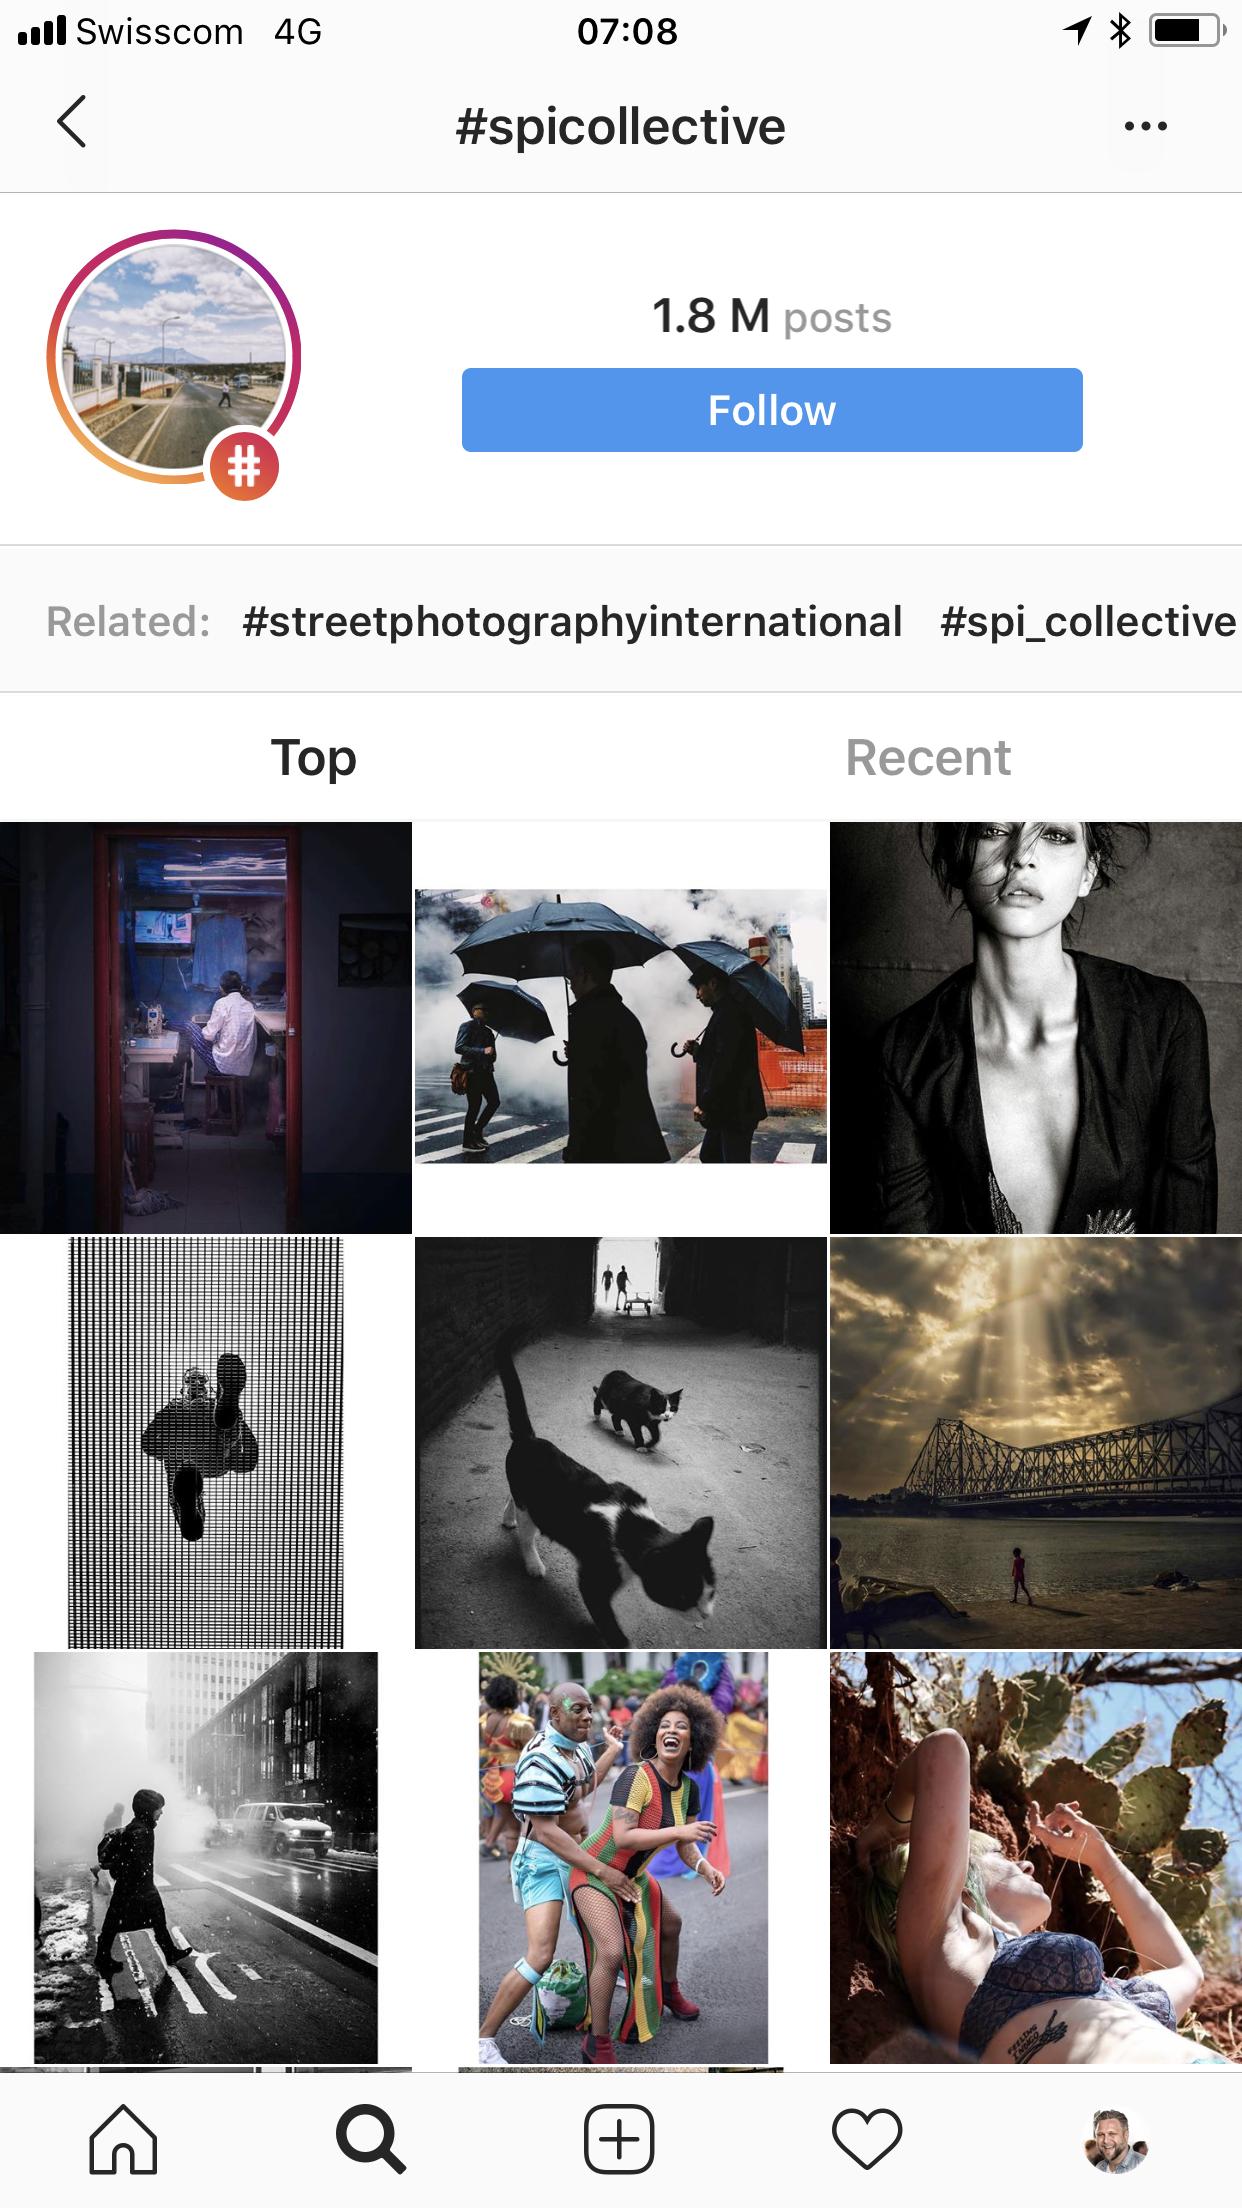 Dan_Roznov_Instagram_Storytelling_digitalEVENT2018_12.png